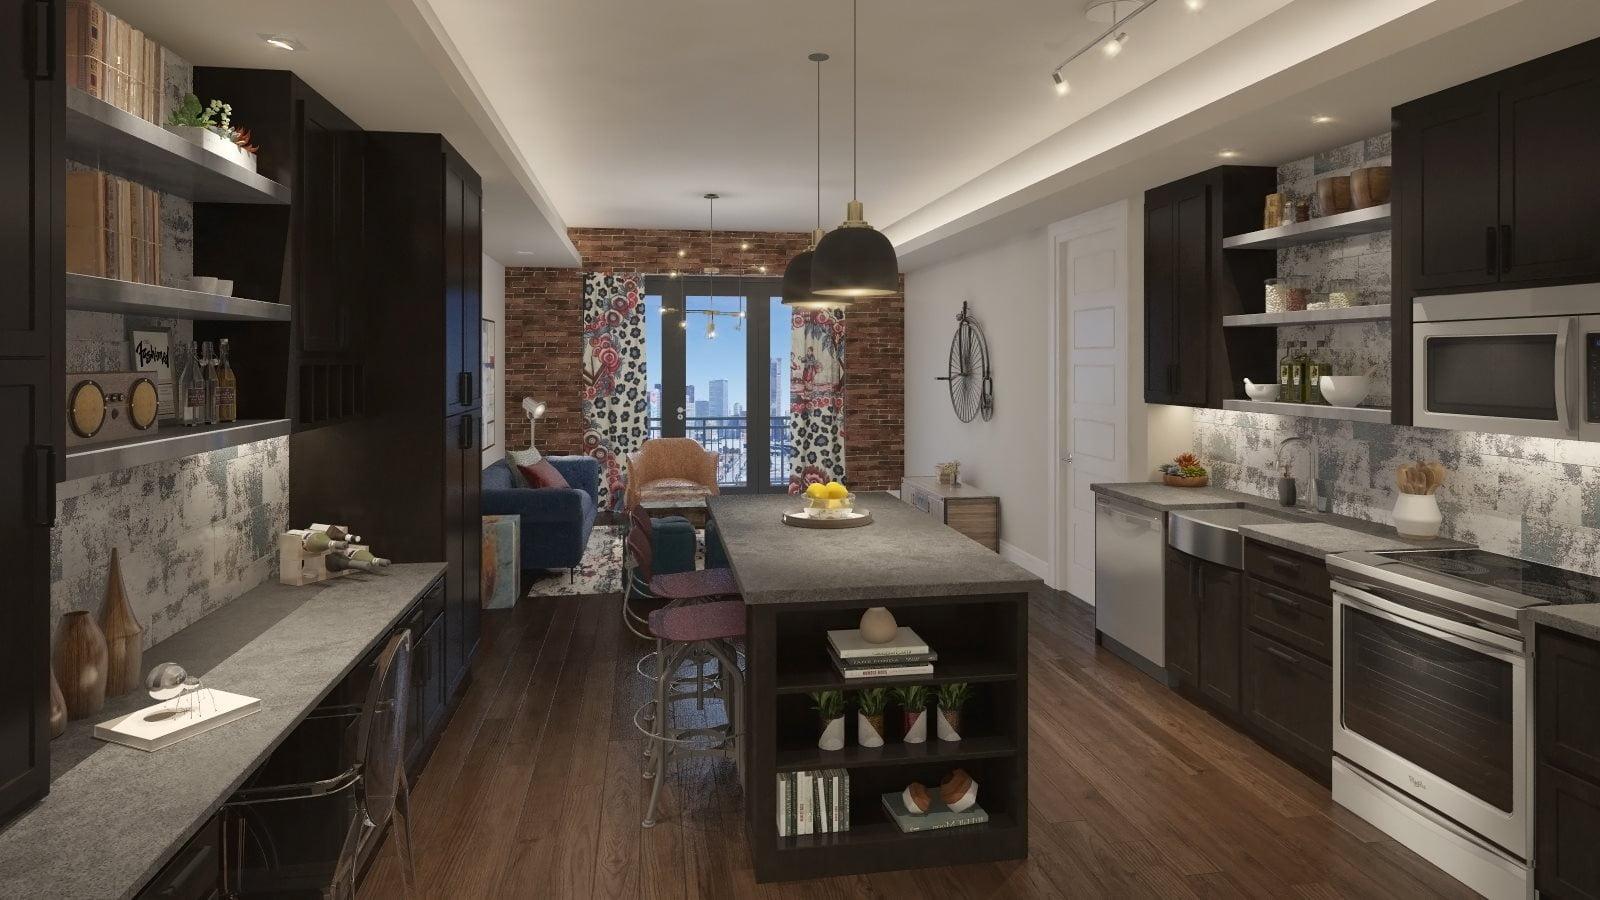 The Case Bldg Deep Ellum Apartments | DFW Apt Nerdz